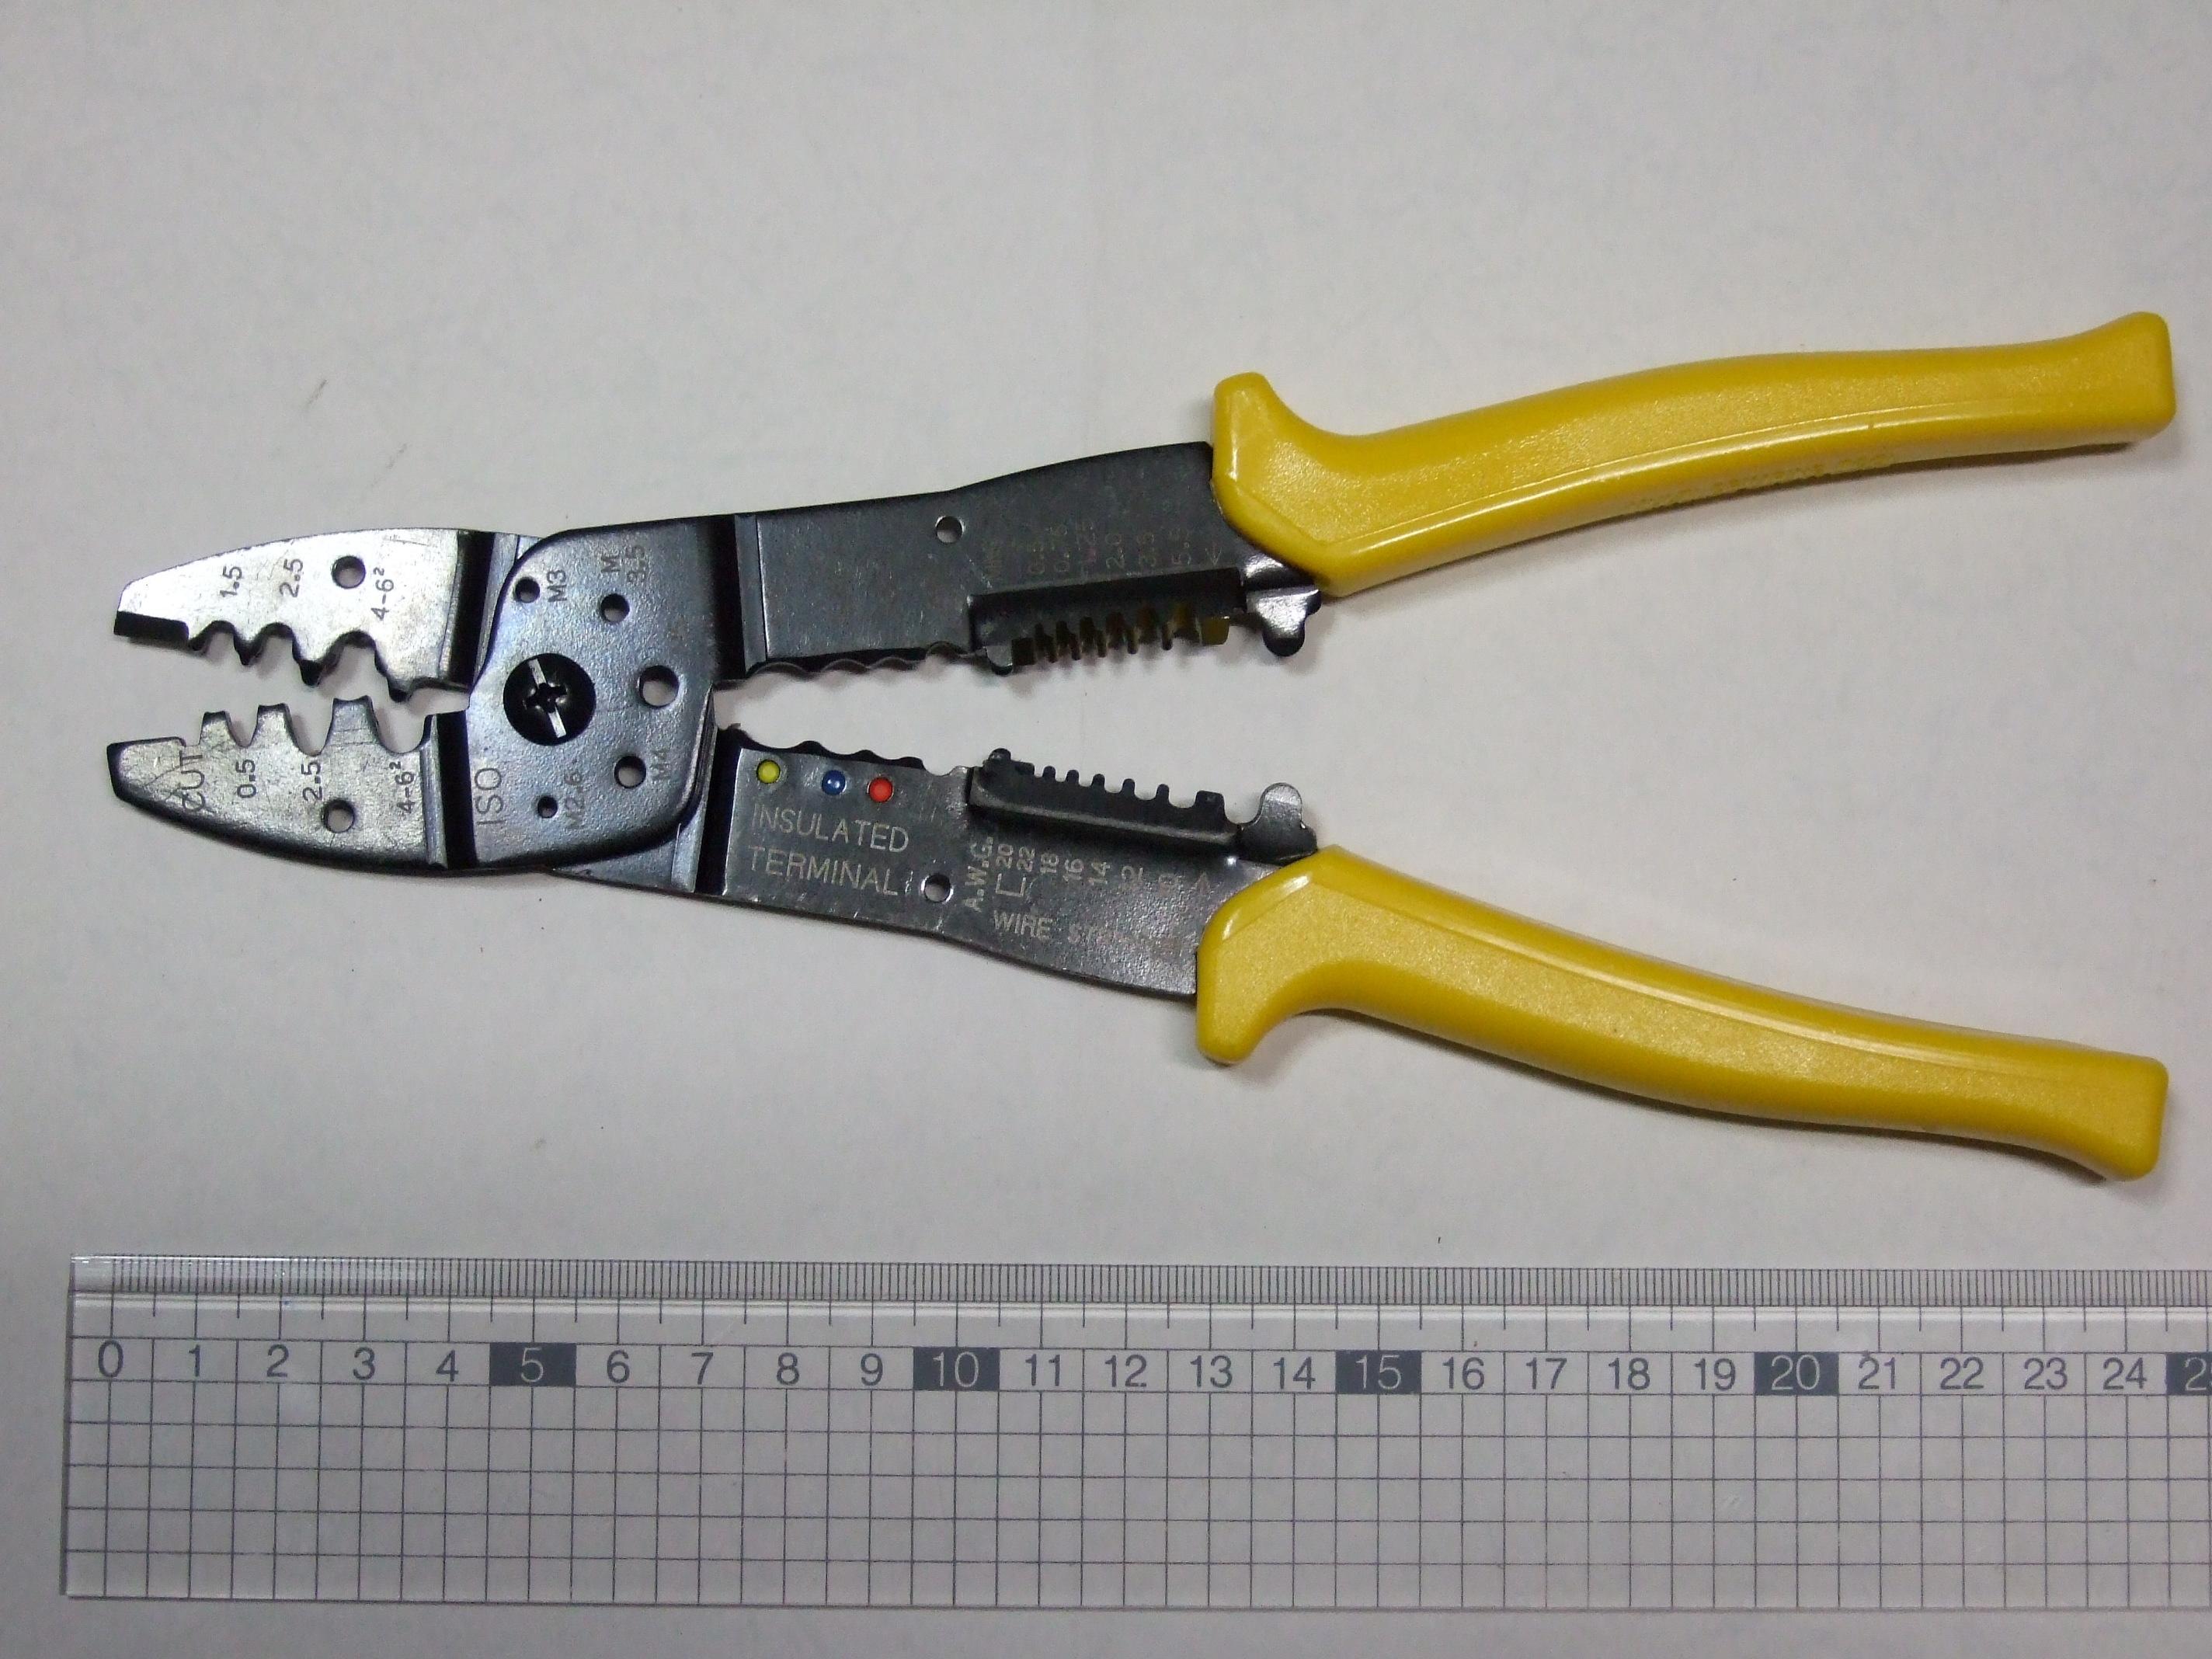 File:Hand crimp tool DX-1008 opening.jpg - Wikimedia Commons